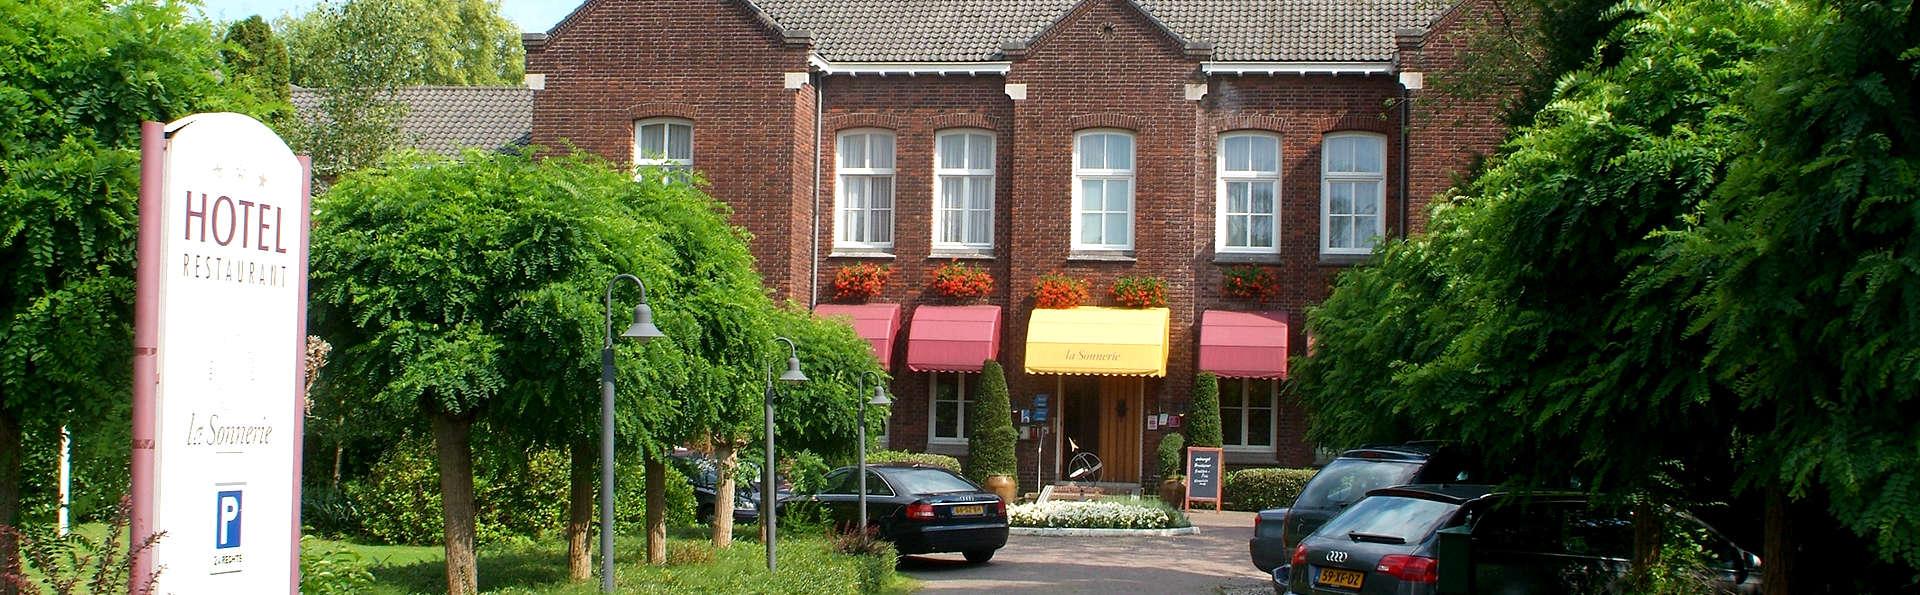 La Sonnerie Hotel - Edit_Front3.jpg